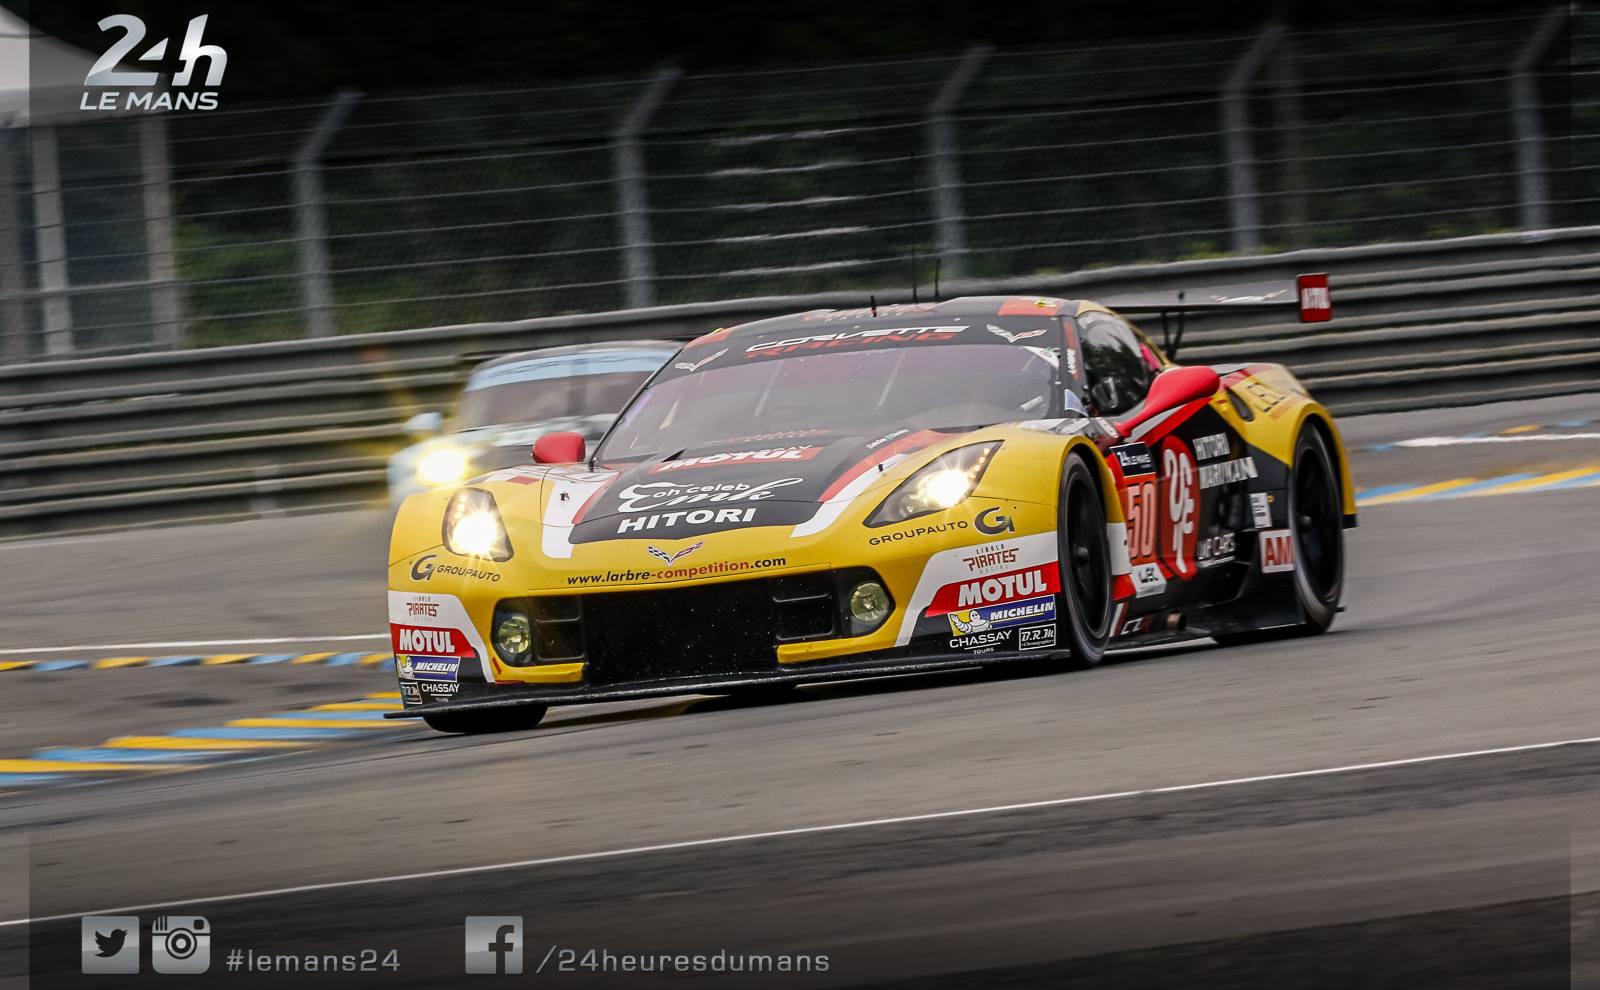 Corvette #50 da Larbre Competition também mostra serviço na classe GTE-AM.